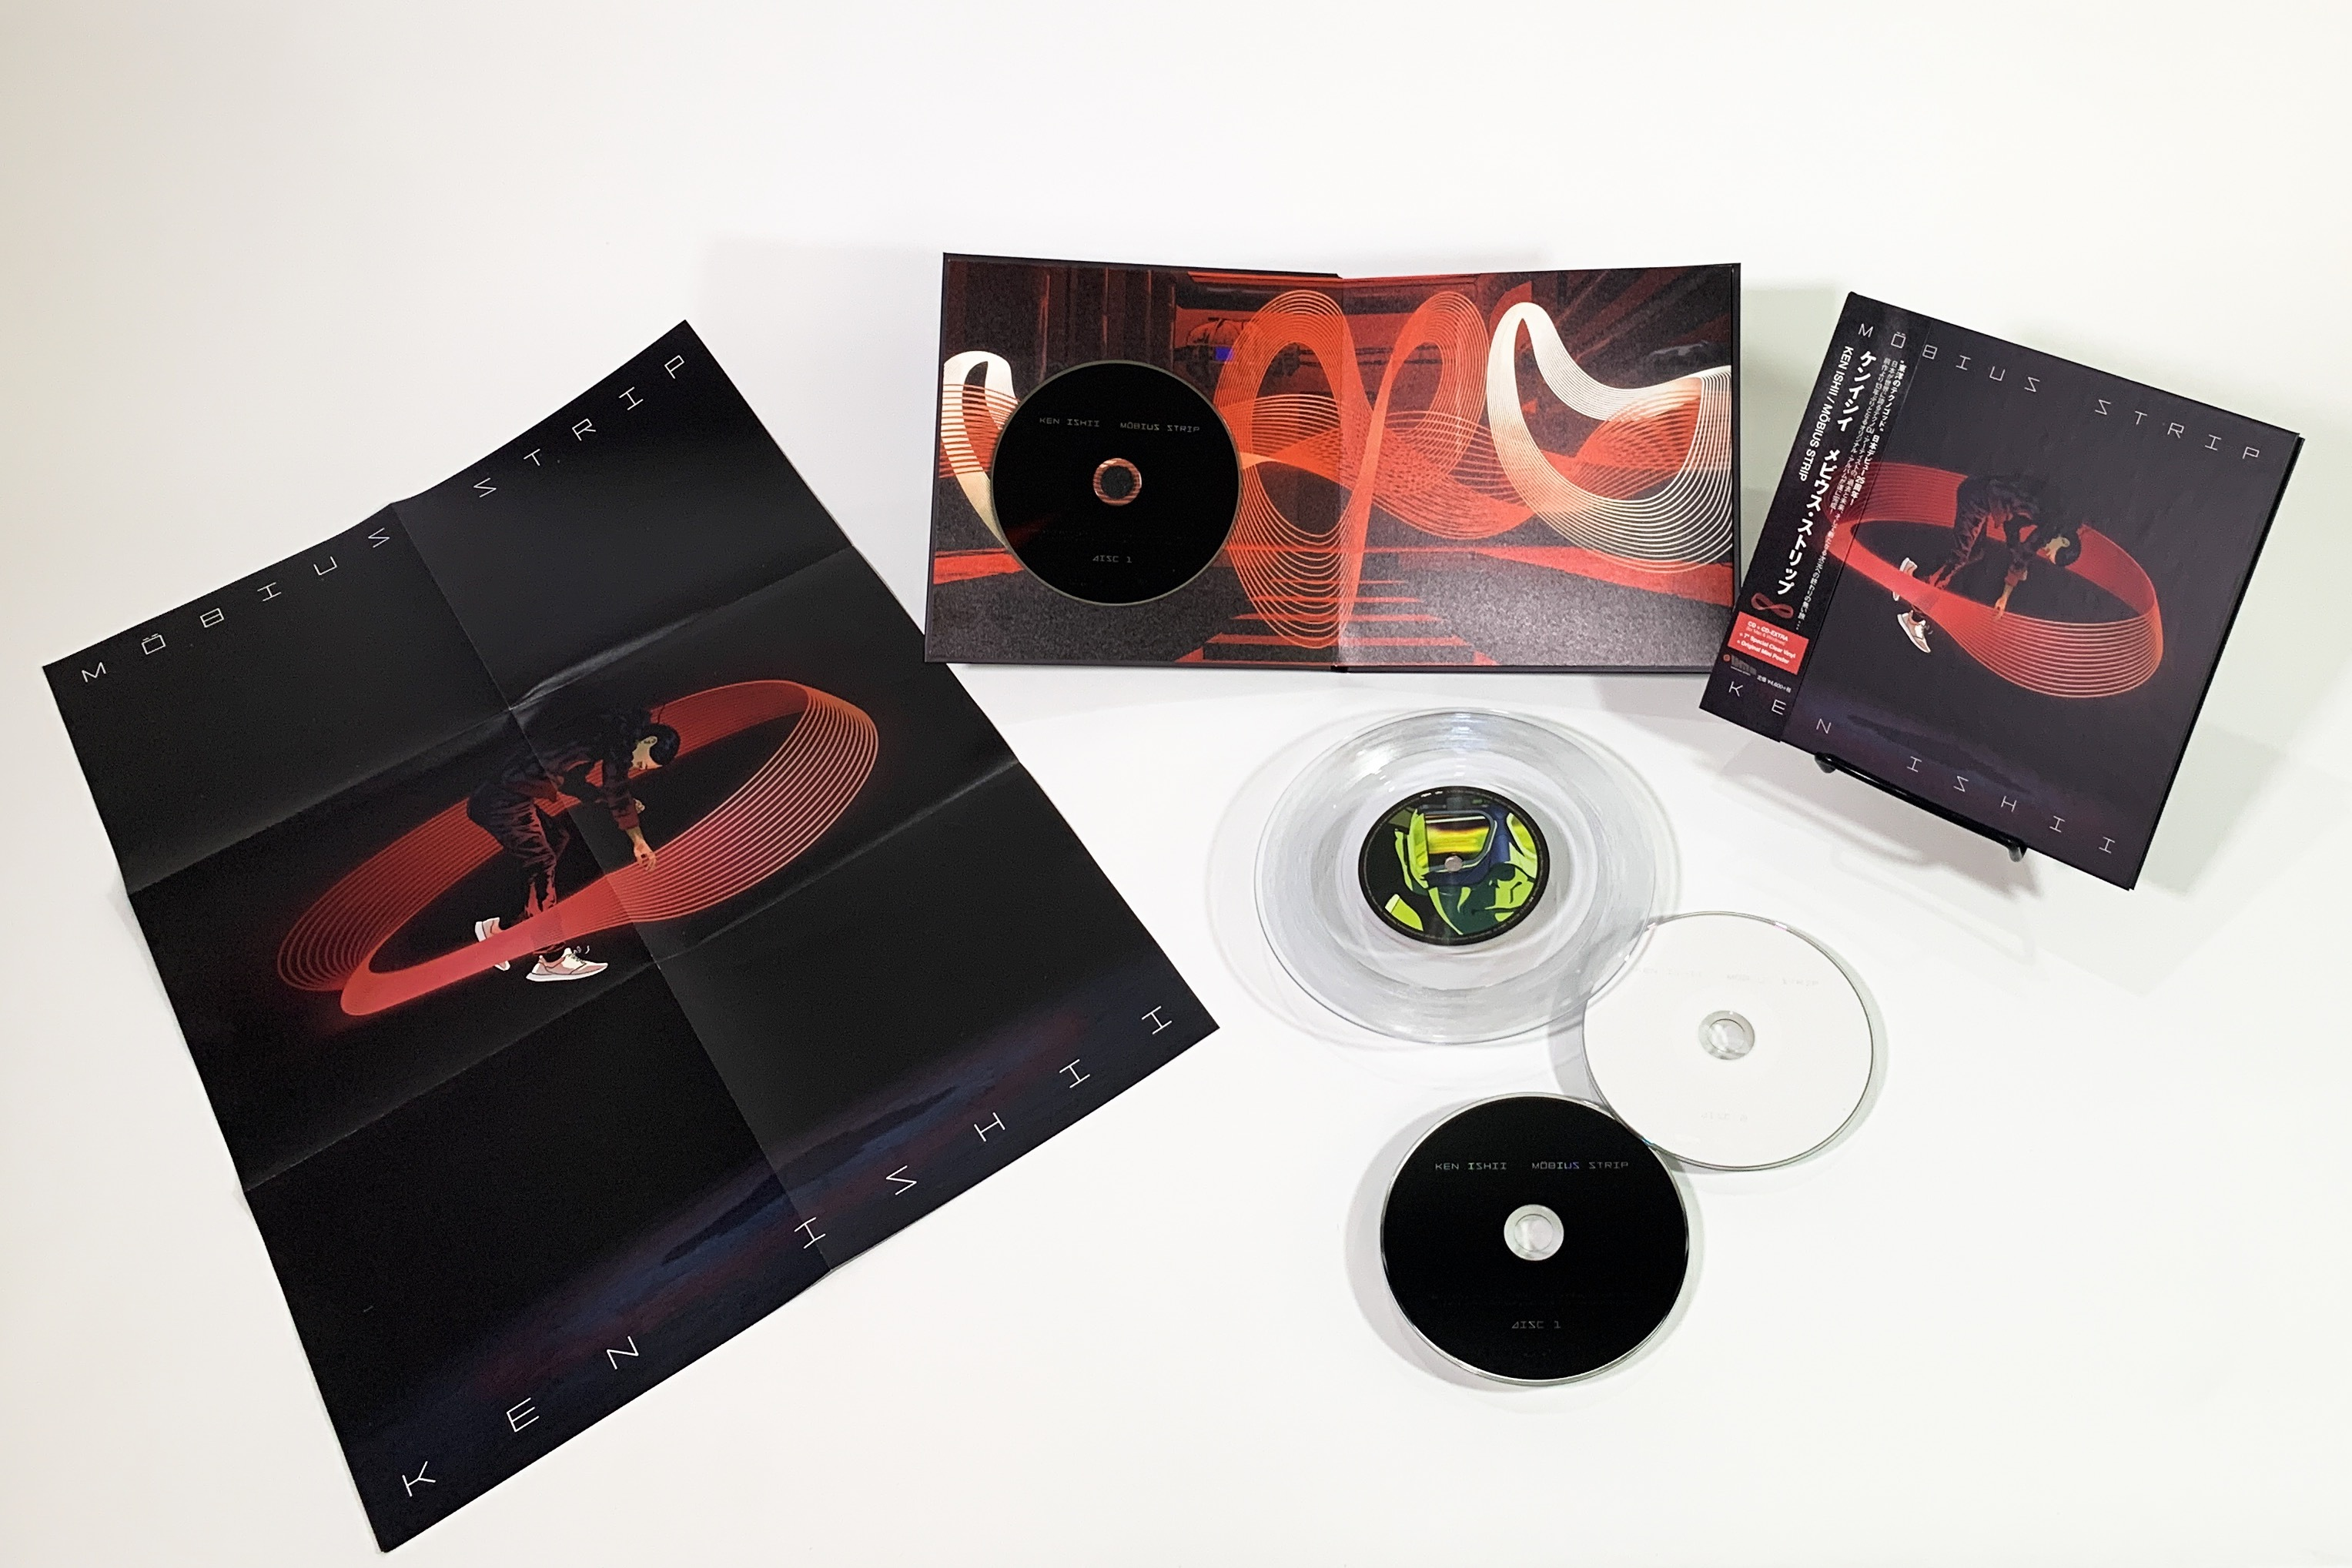 KEN ISHII - 『Möbius Strip』【完全生産限定盤Type A】 - 画像2